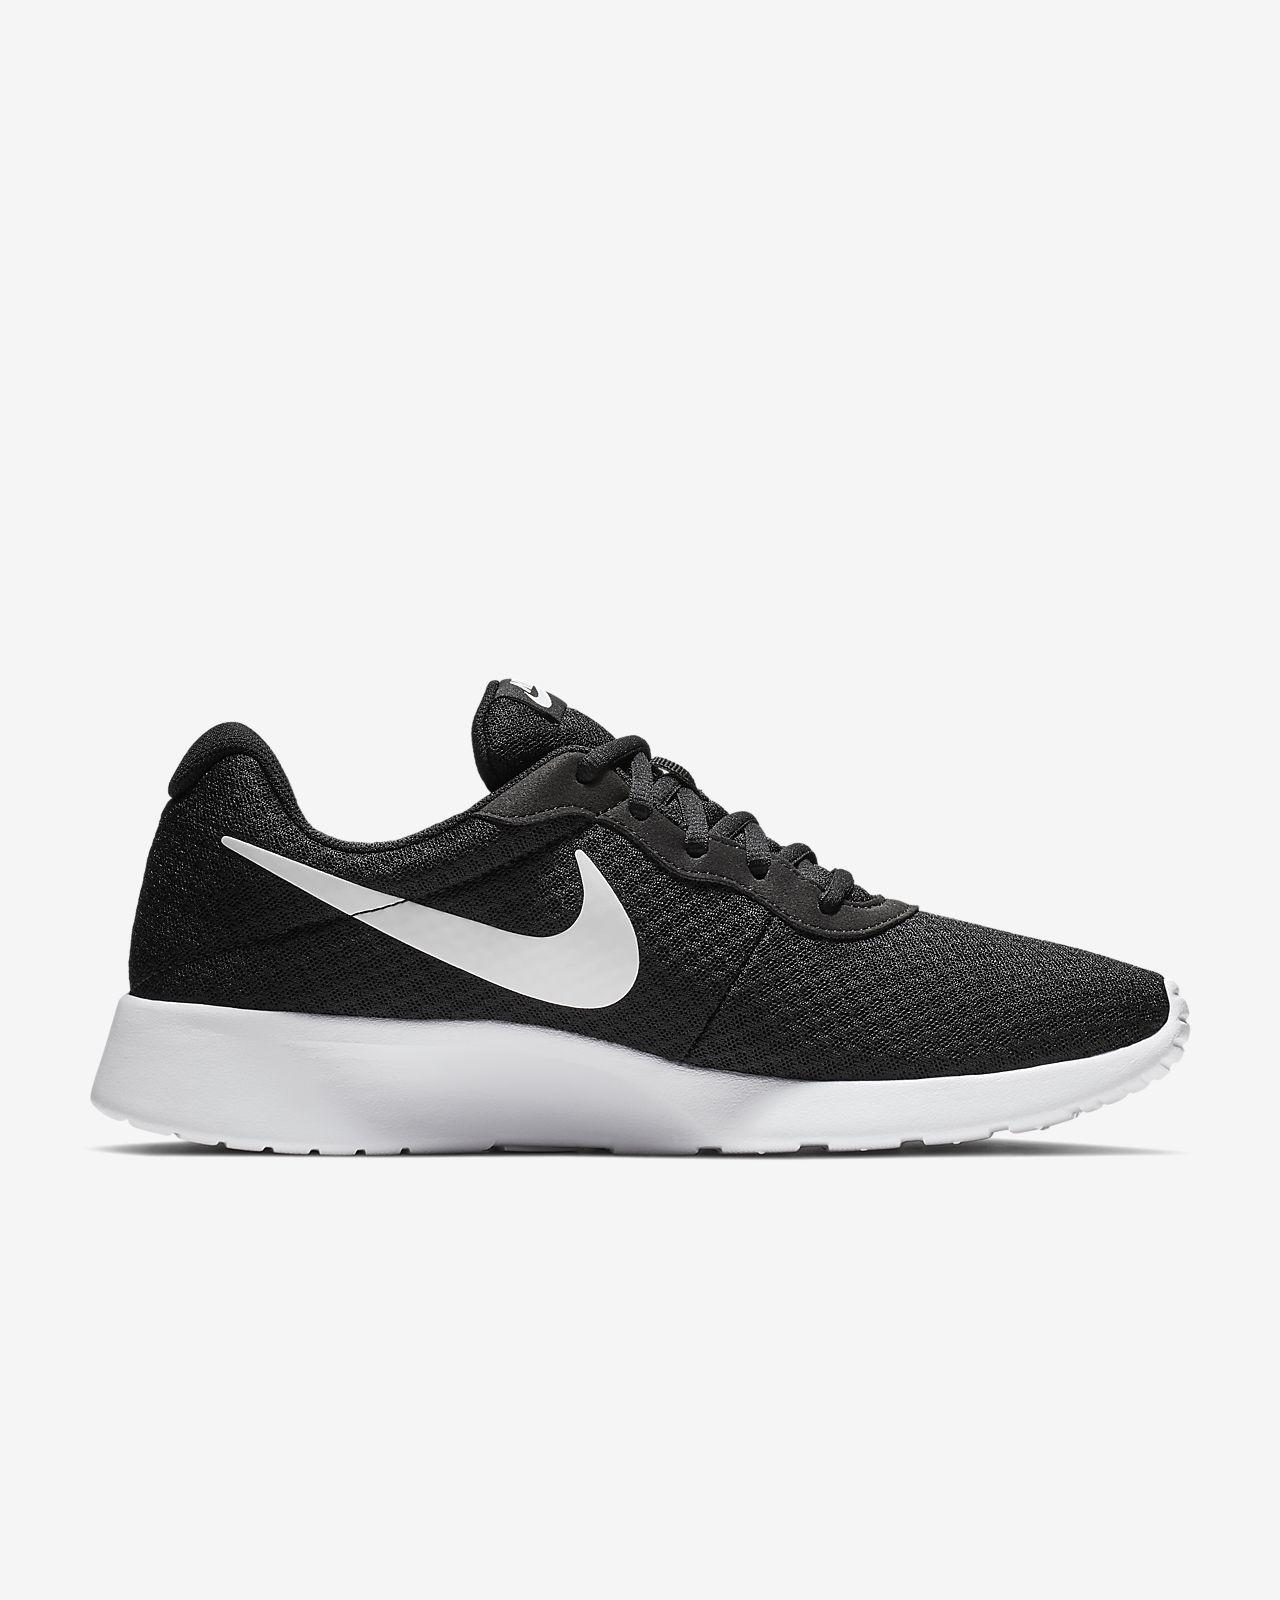 cc431f498b2 Nike Tanjun Men's Shoe